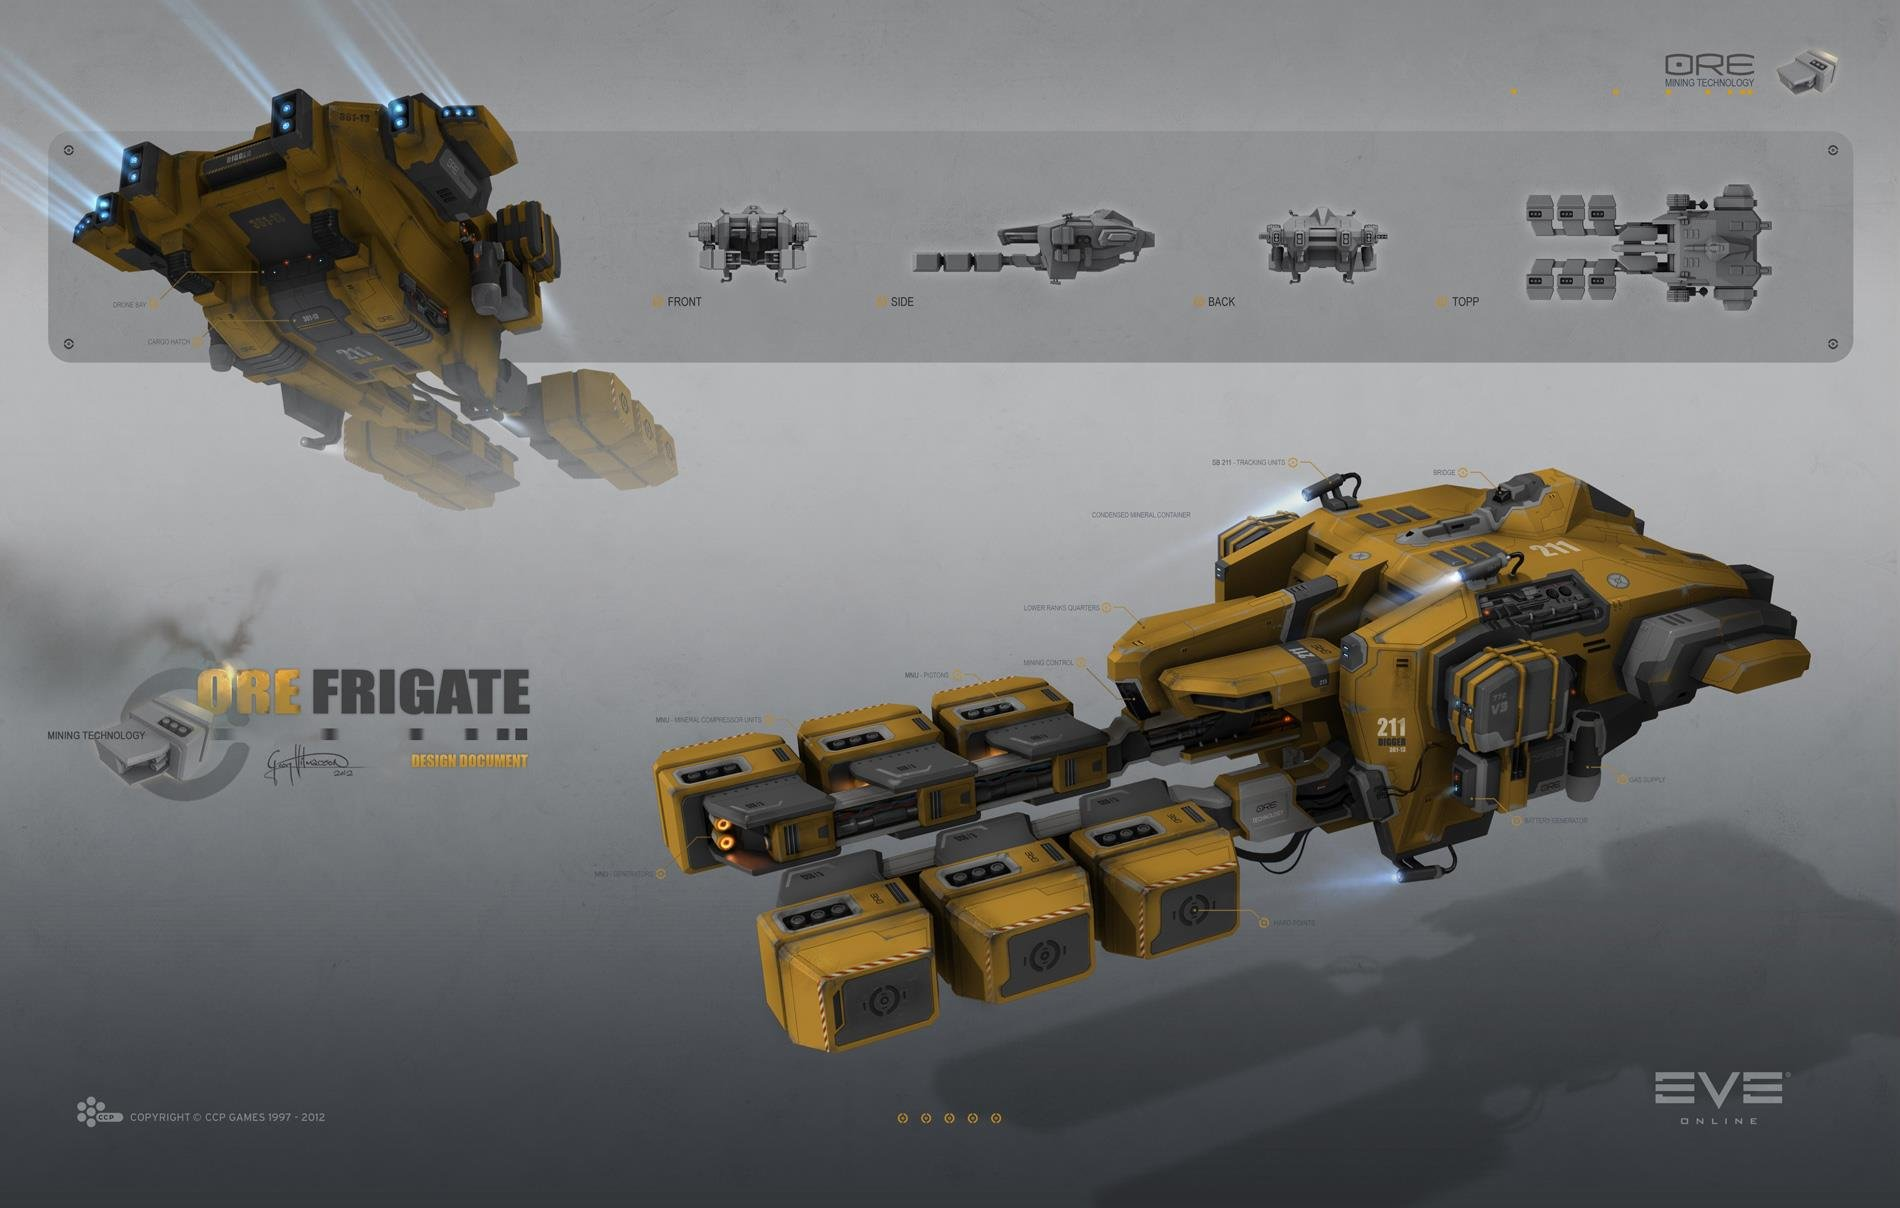 medium resolution of mining frigate venture concept for eve online